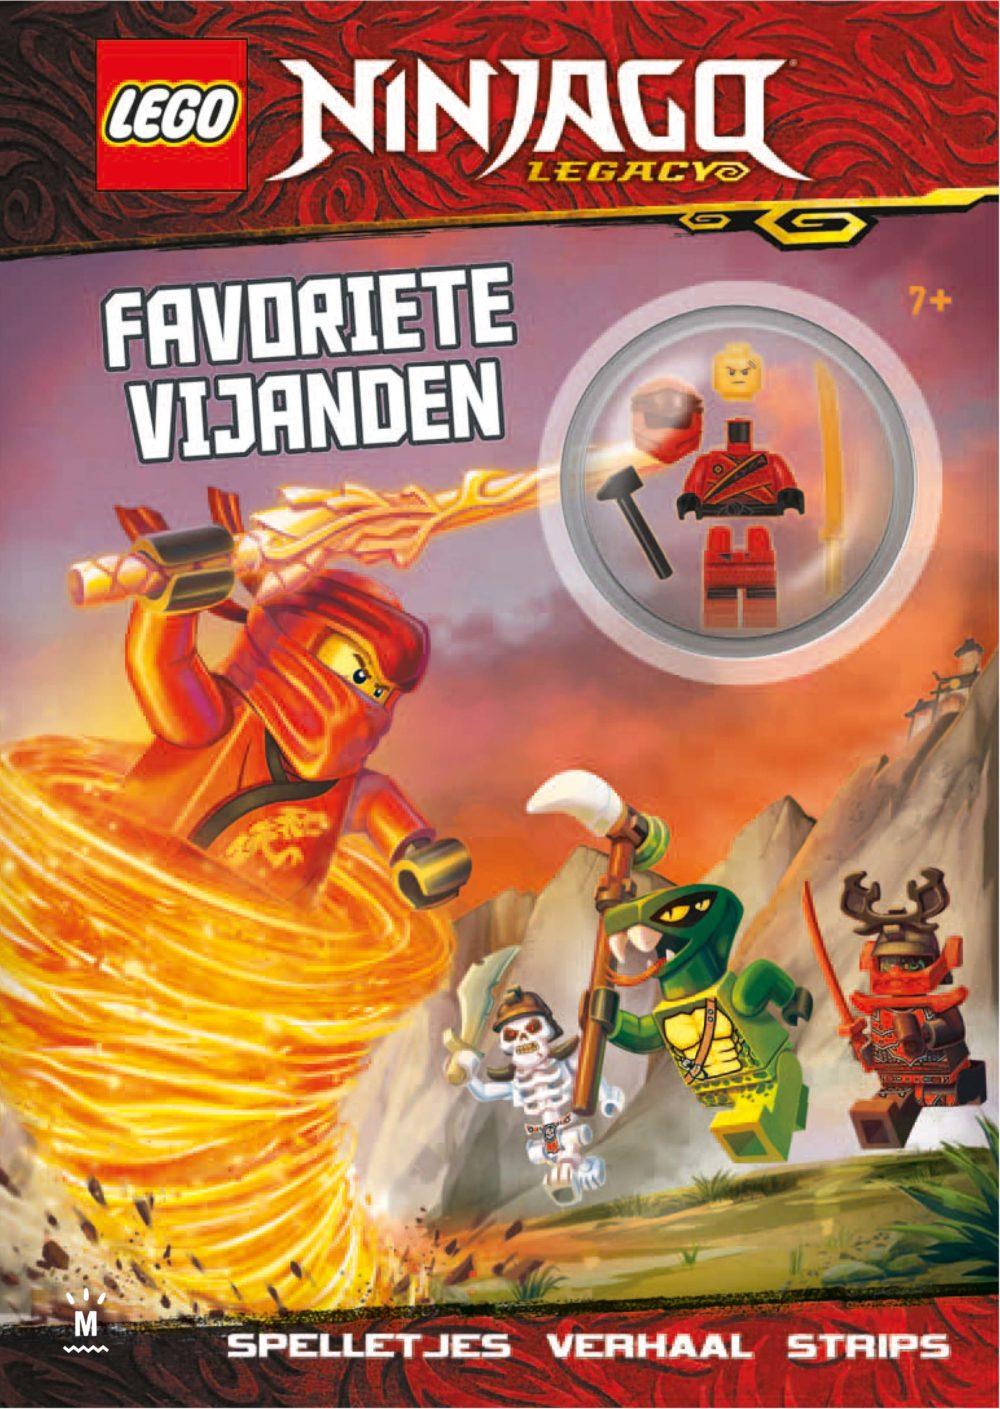 LEGO NINJAGO doe boek